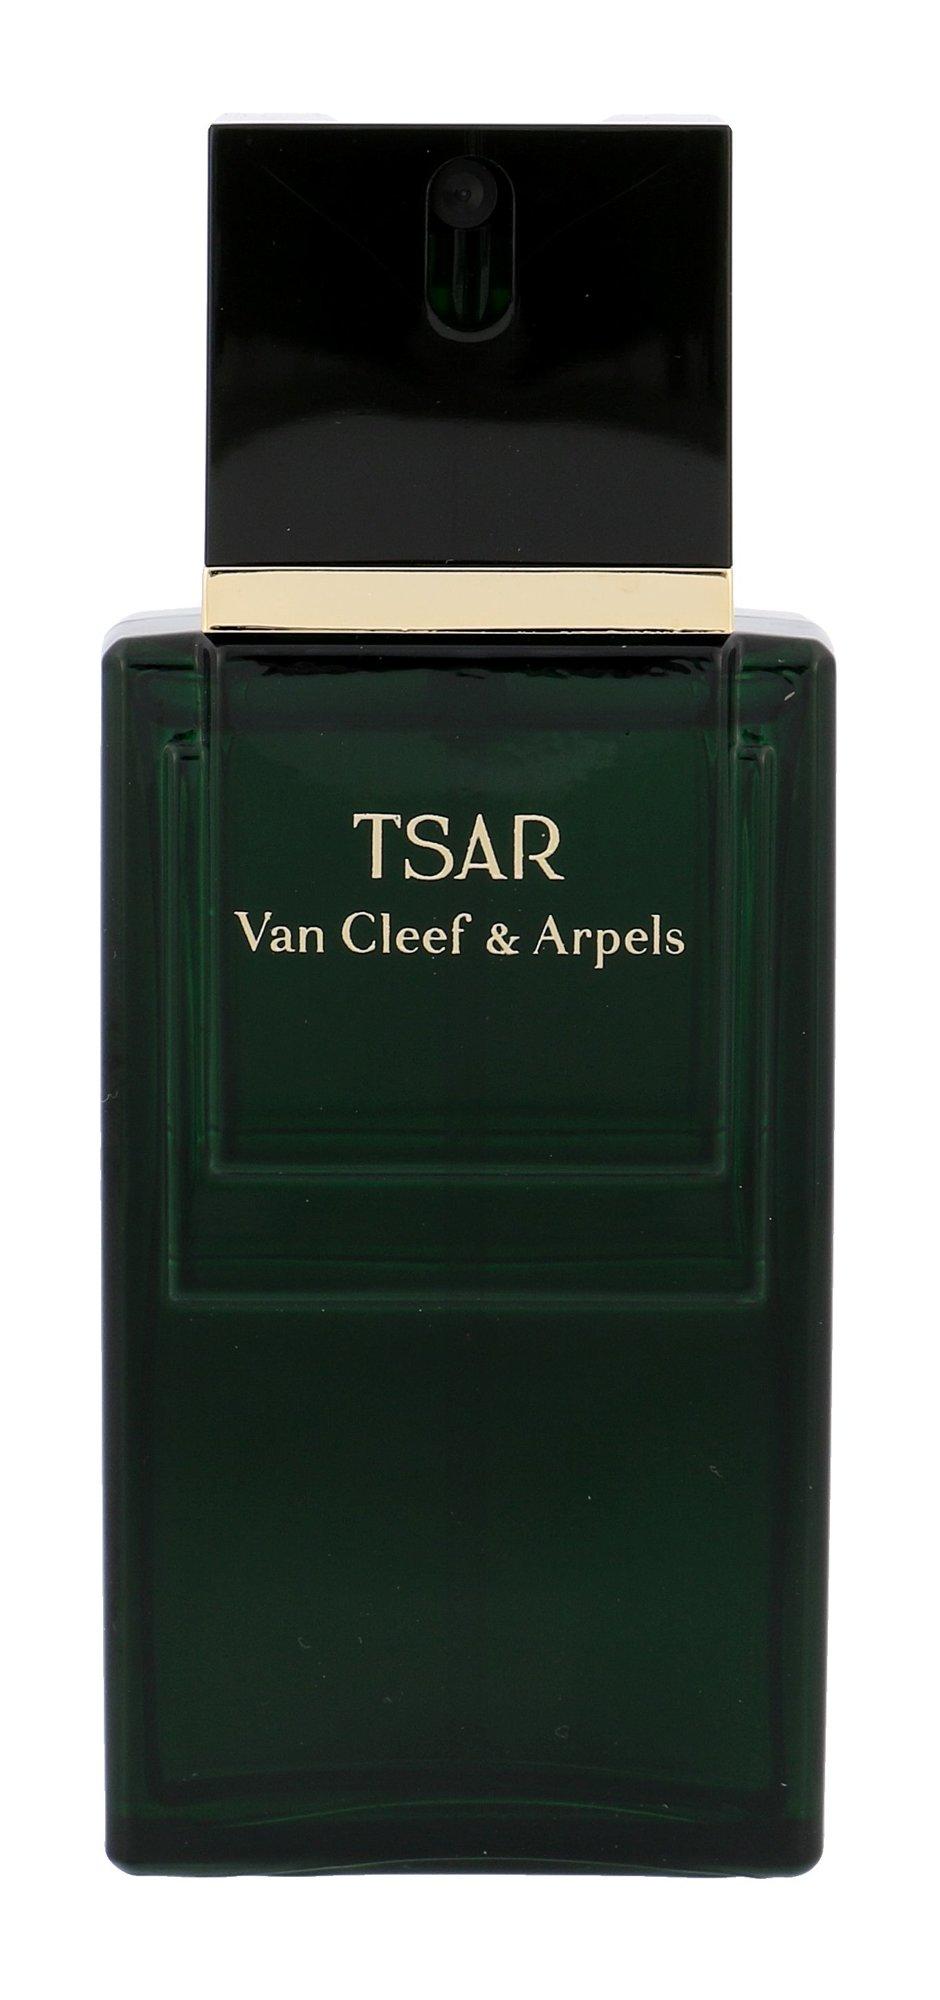 Van Cleef & Arpels Tsar EDT 50ml